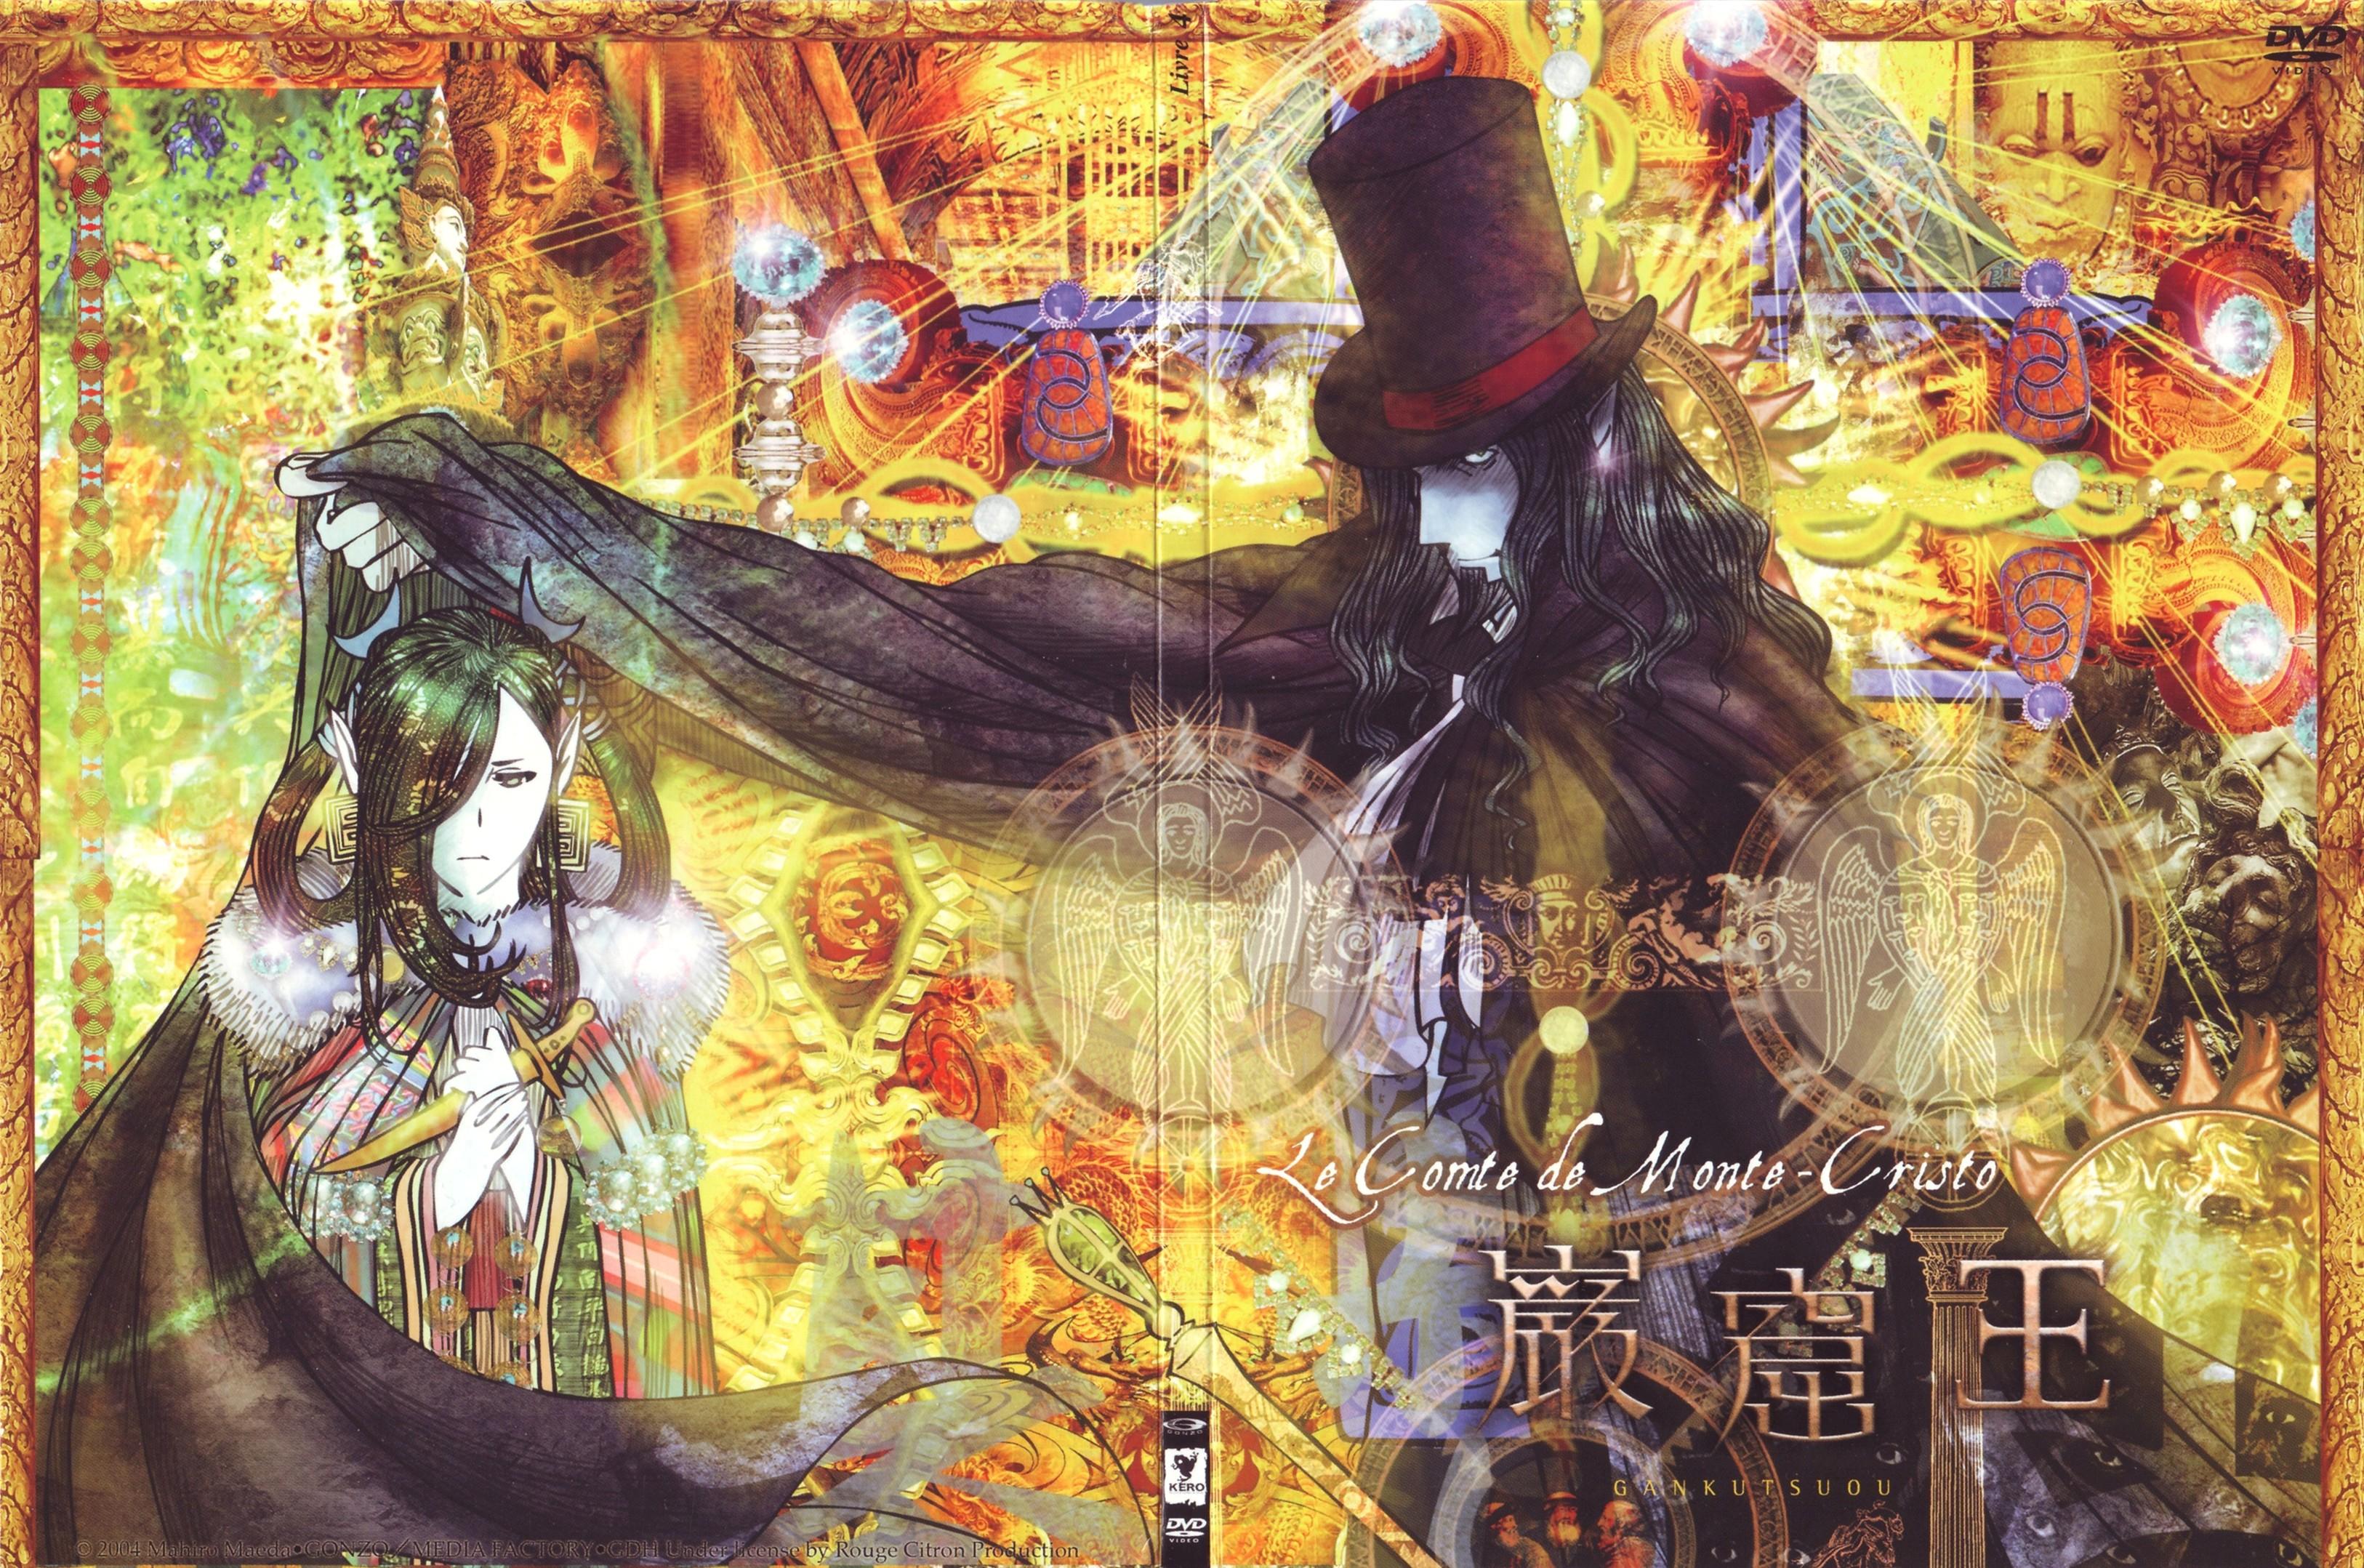 Gankutsuou The Count Of Monte Cristo Download Image